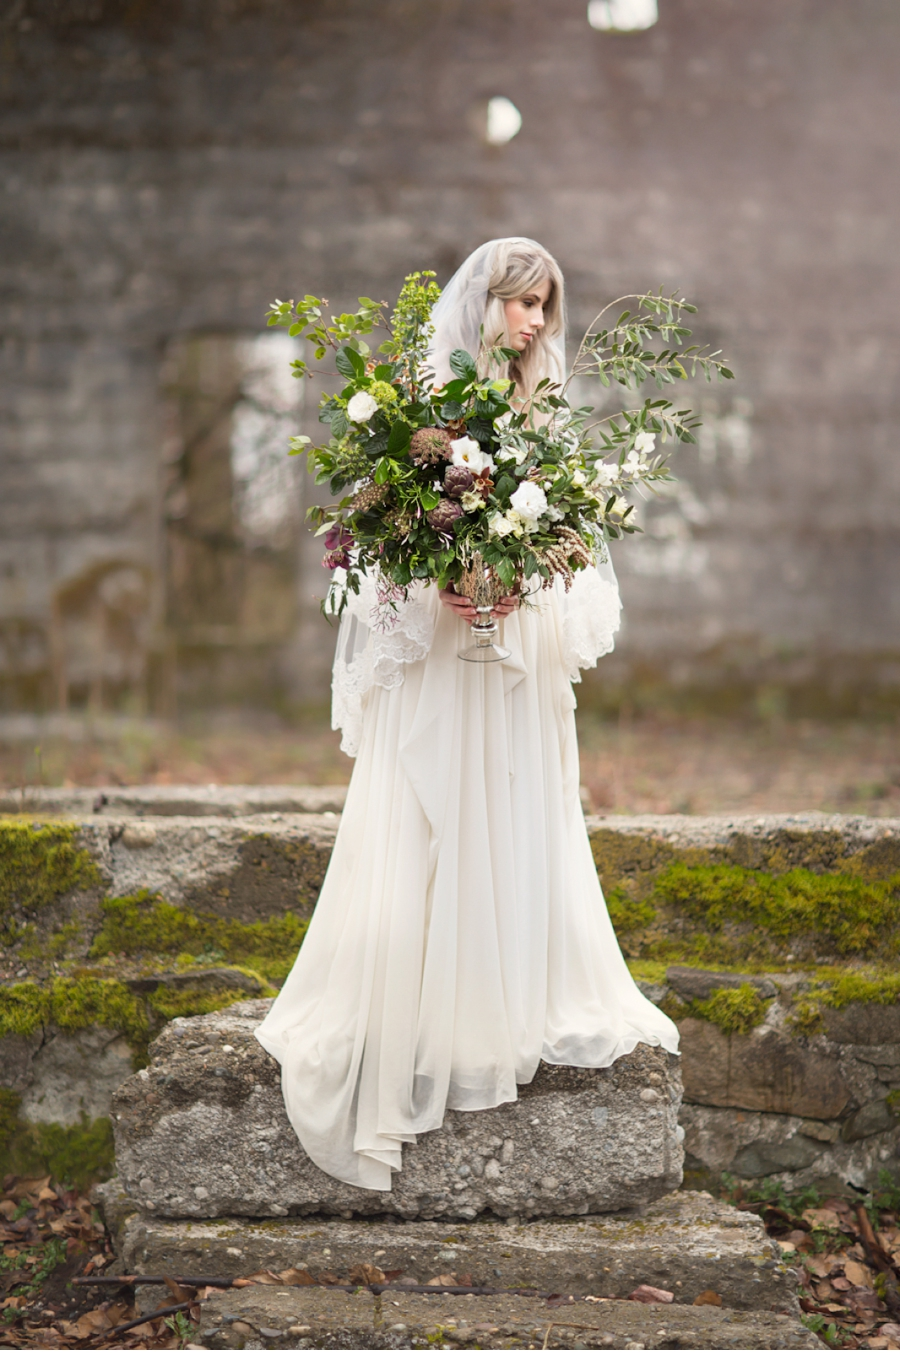 Vale Vine Versatile Bridal Style Among Ruins Home